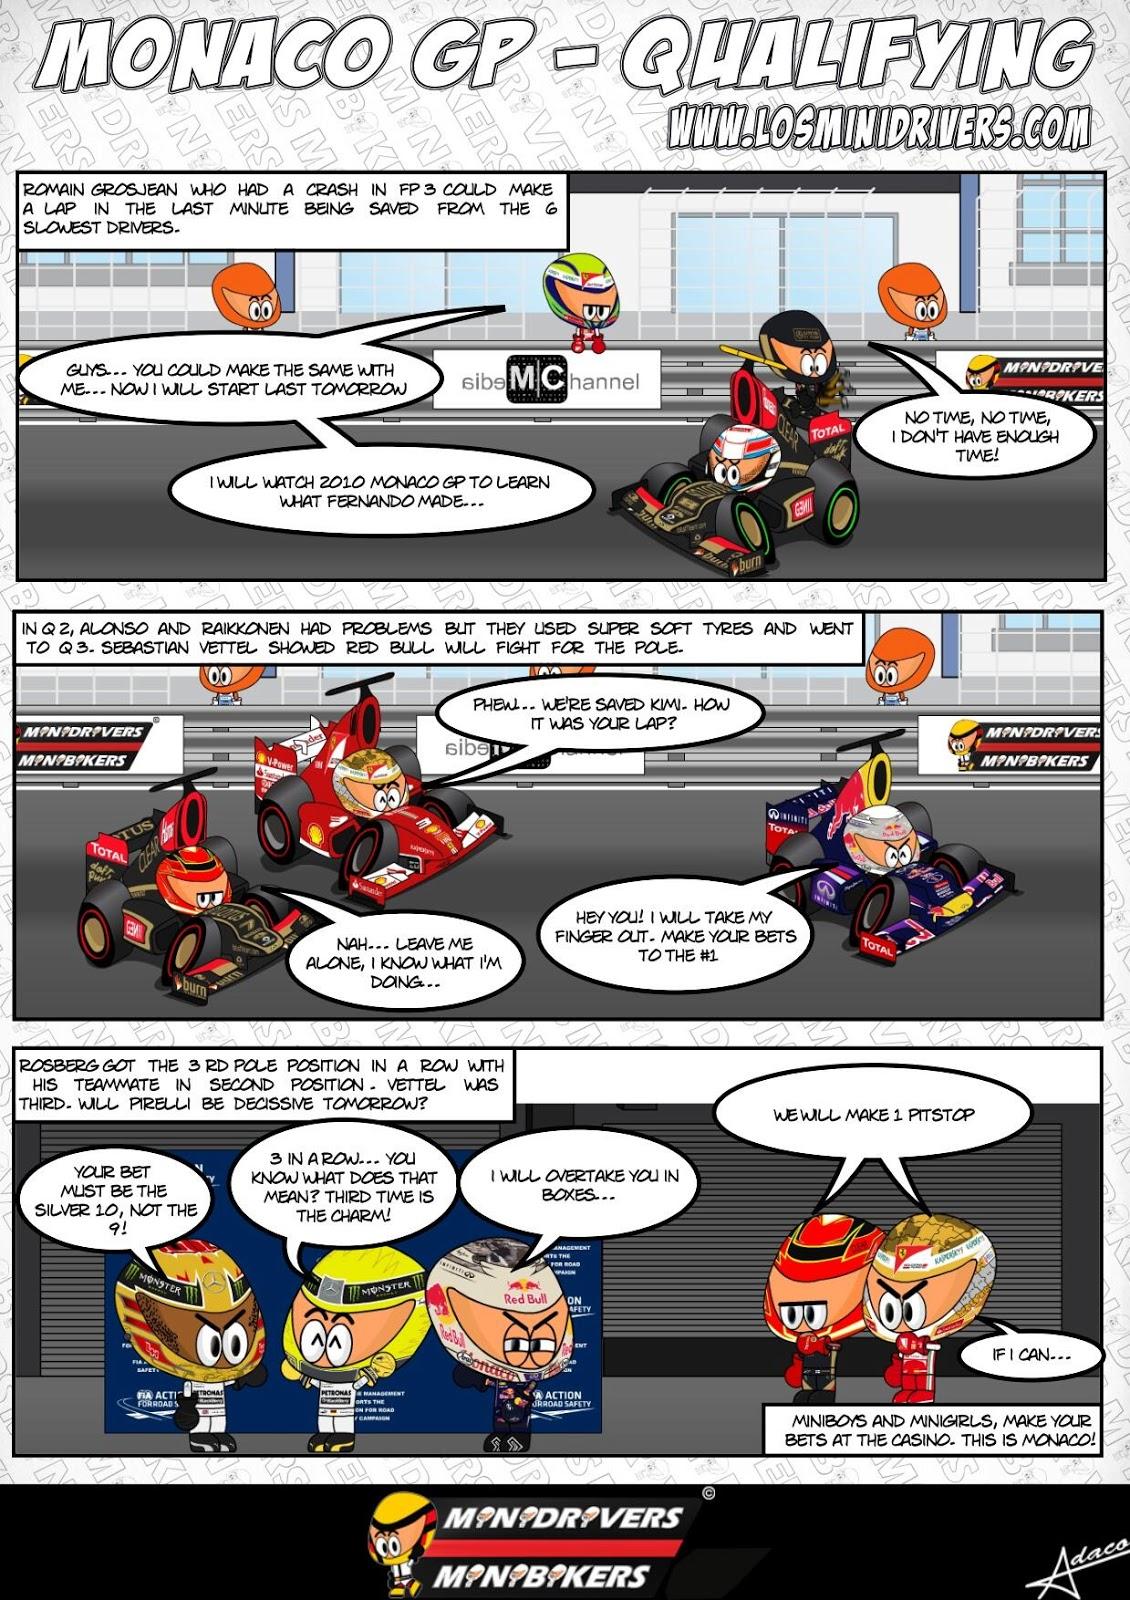 комикс MiniDrivers по квалификации на Гран-при Монако 2013